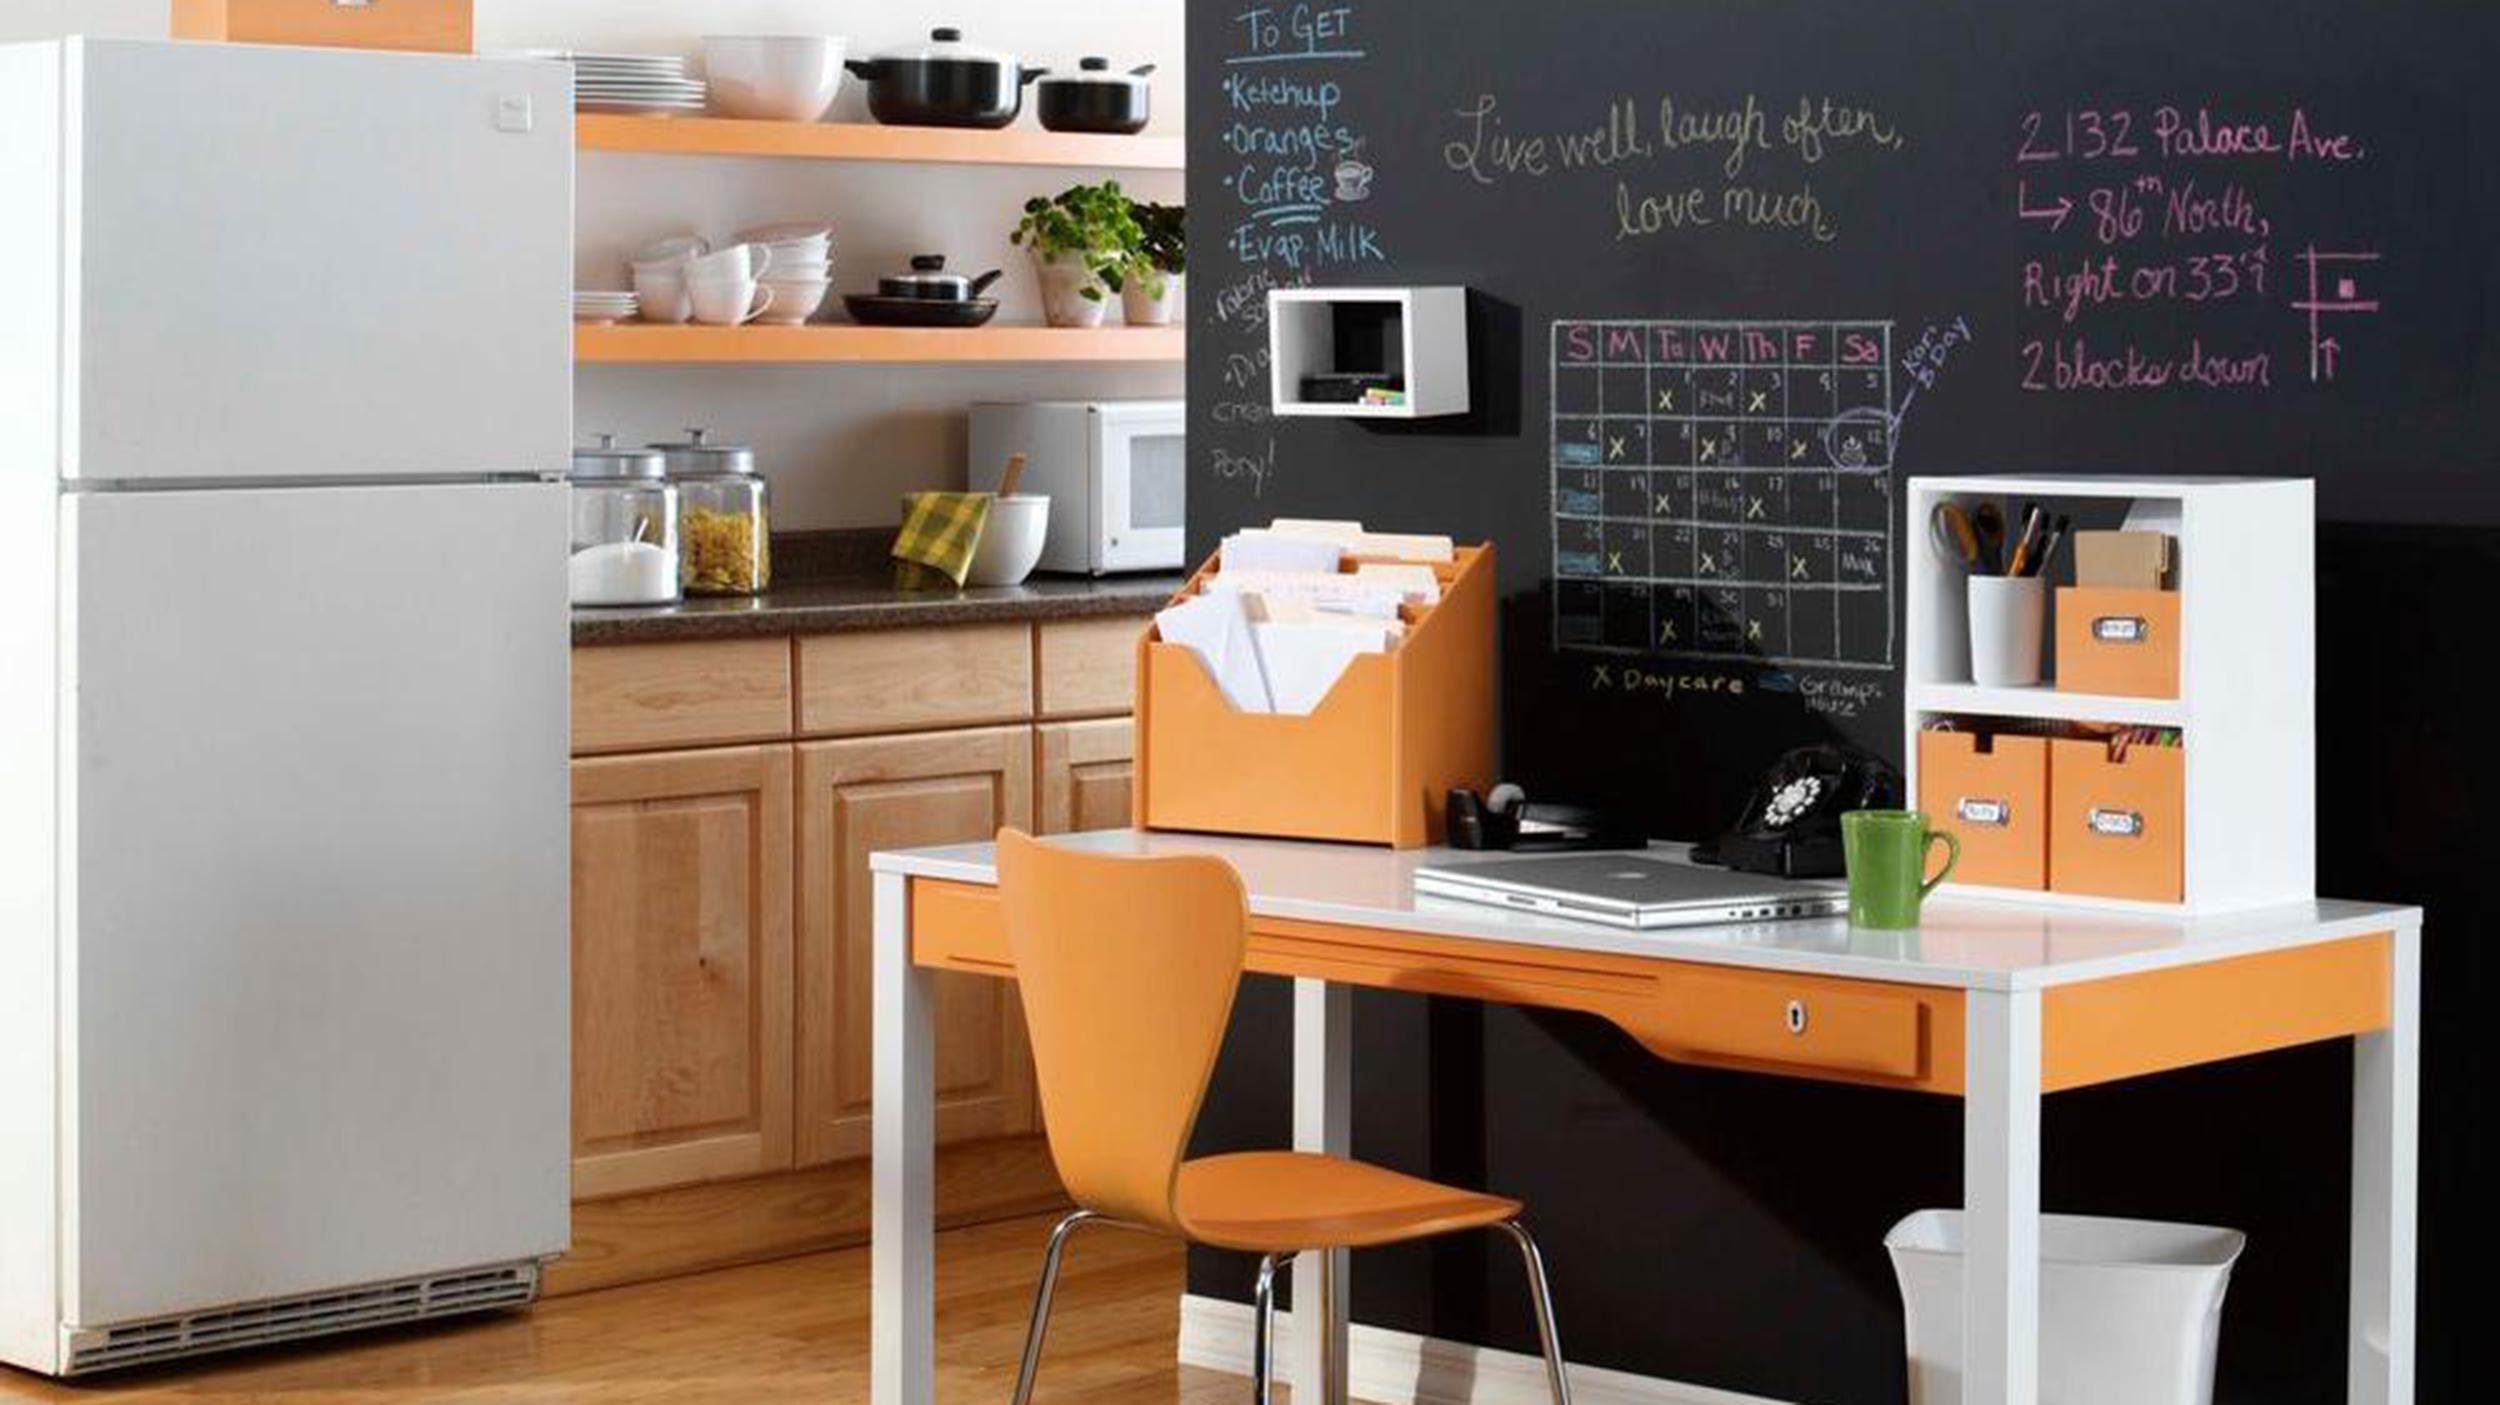 Rental Apartment Decorating Ideas Cnn Underscored